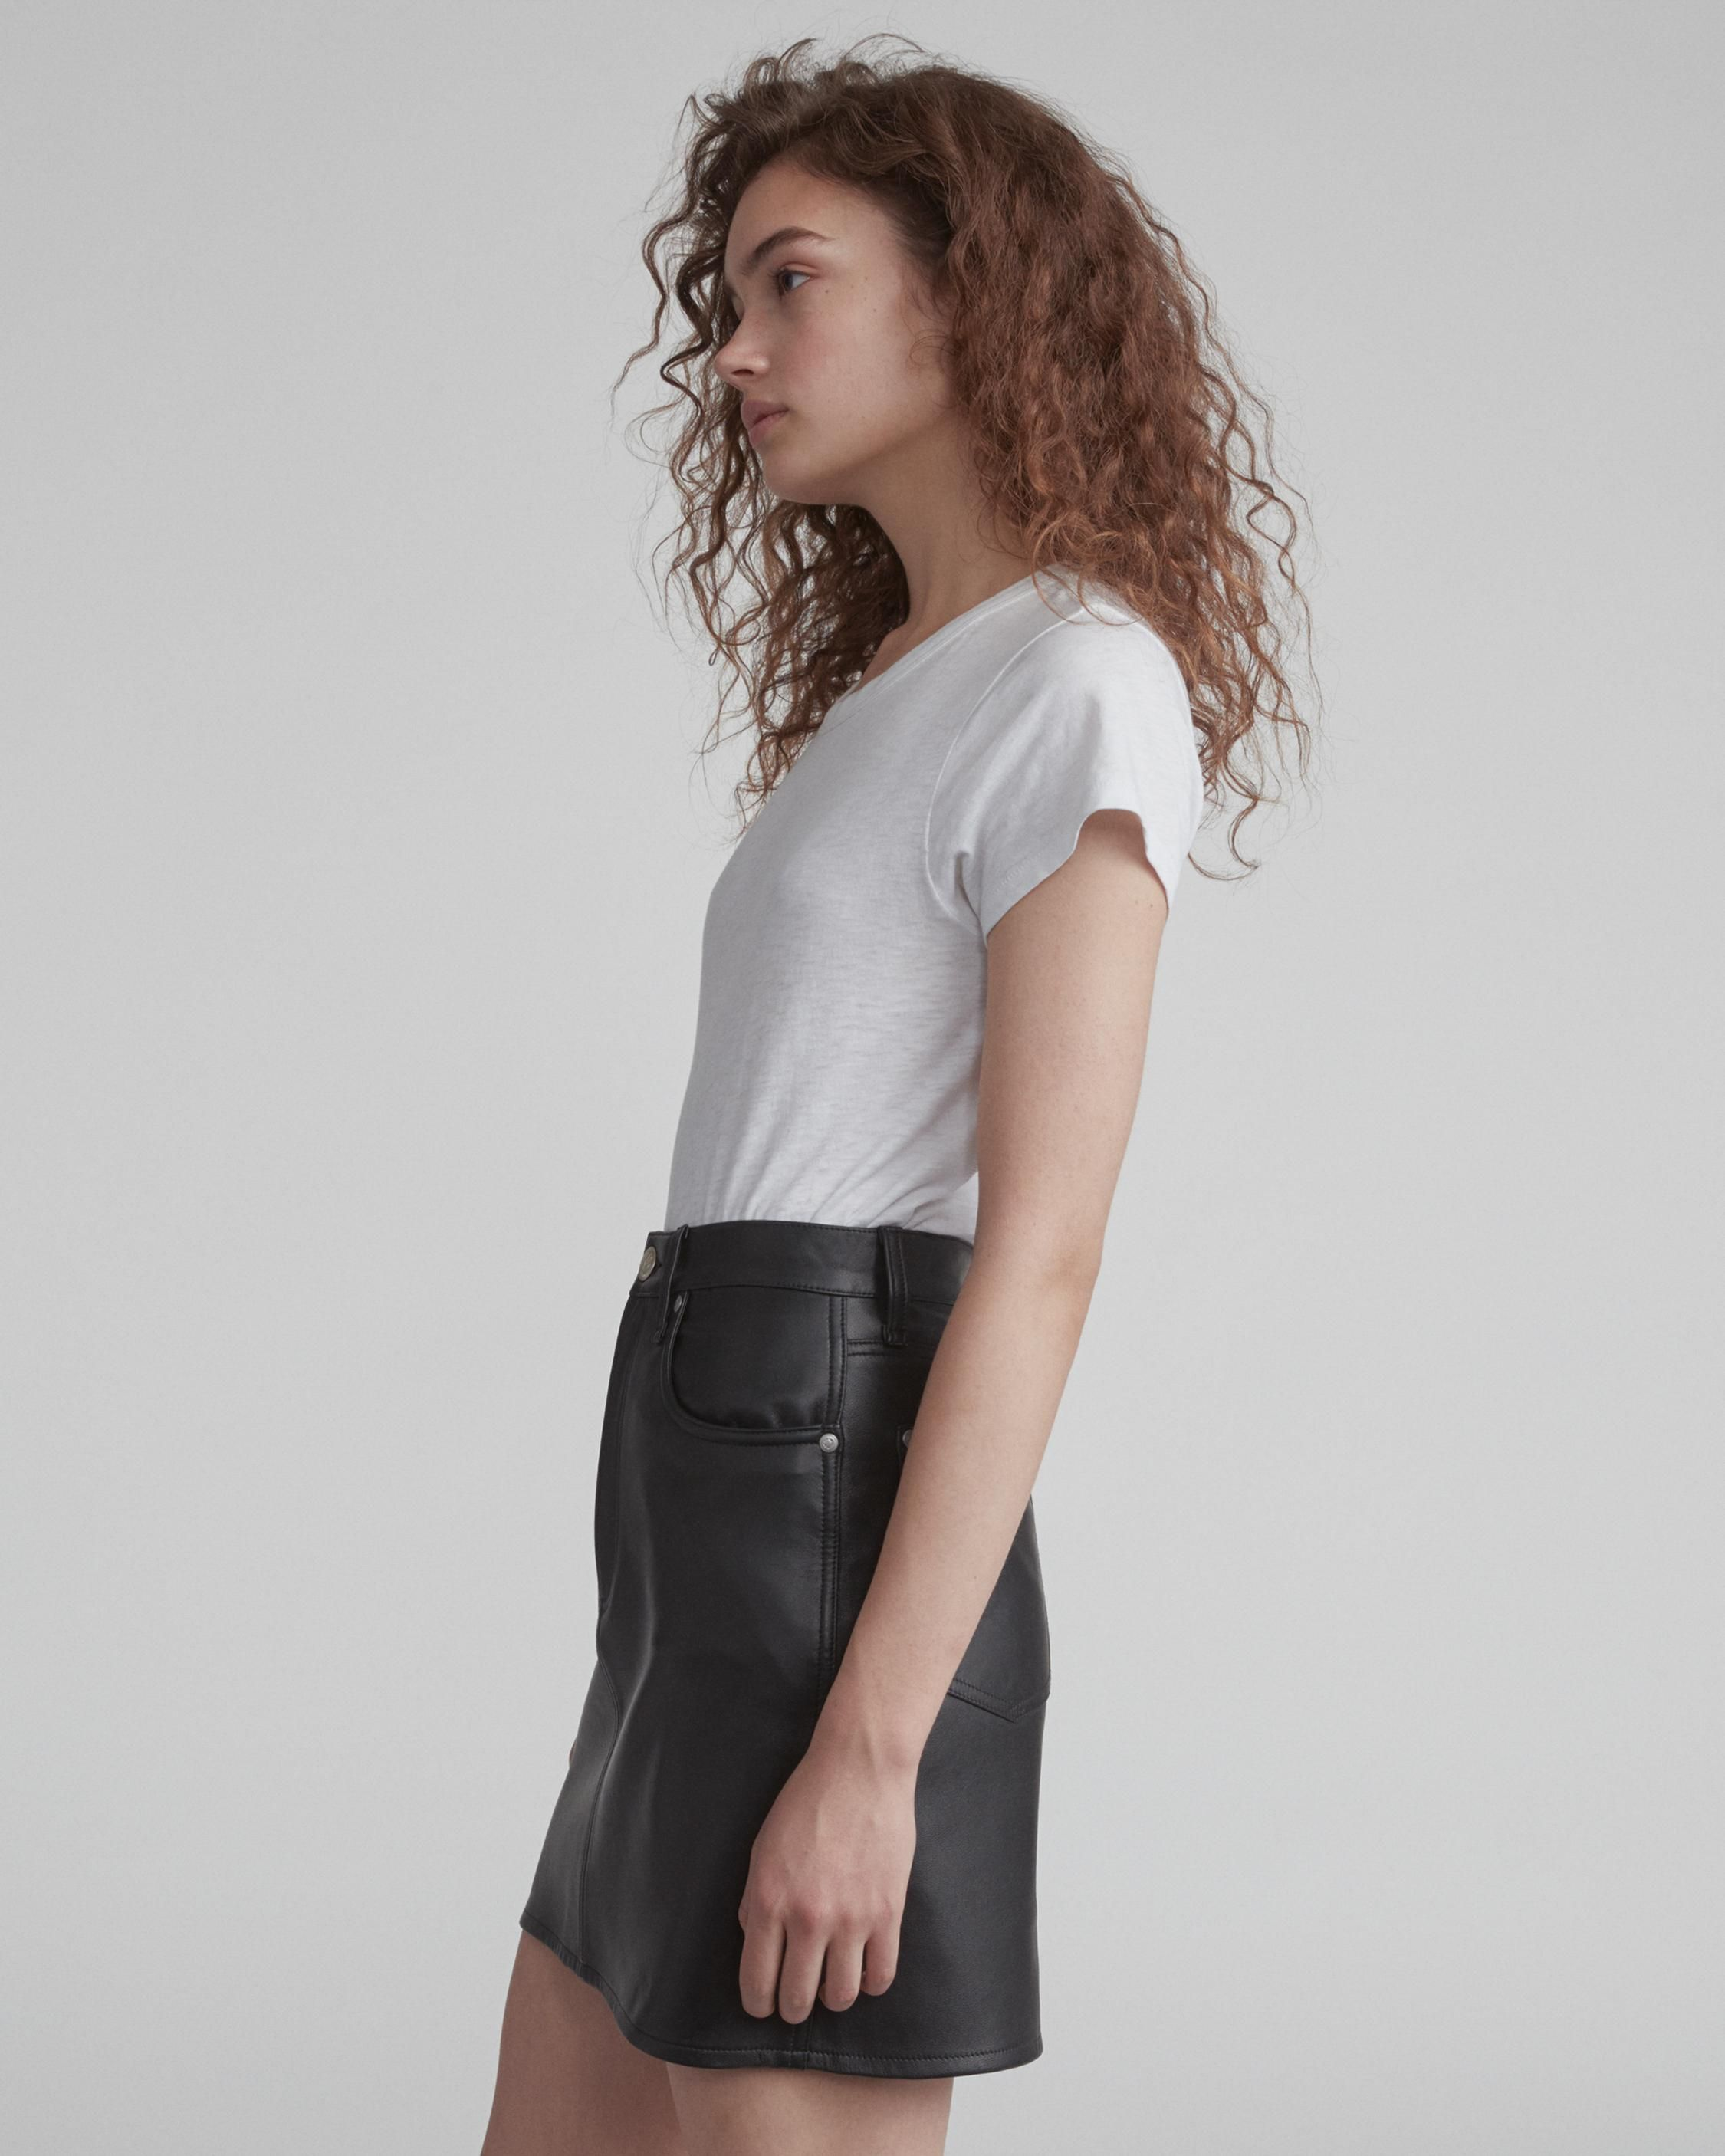 fbe15a3a5 Moss Leather Skirt | Women Dresses & Skirts | rag & bone | Future ...